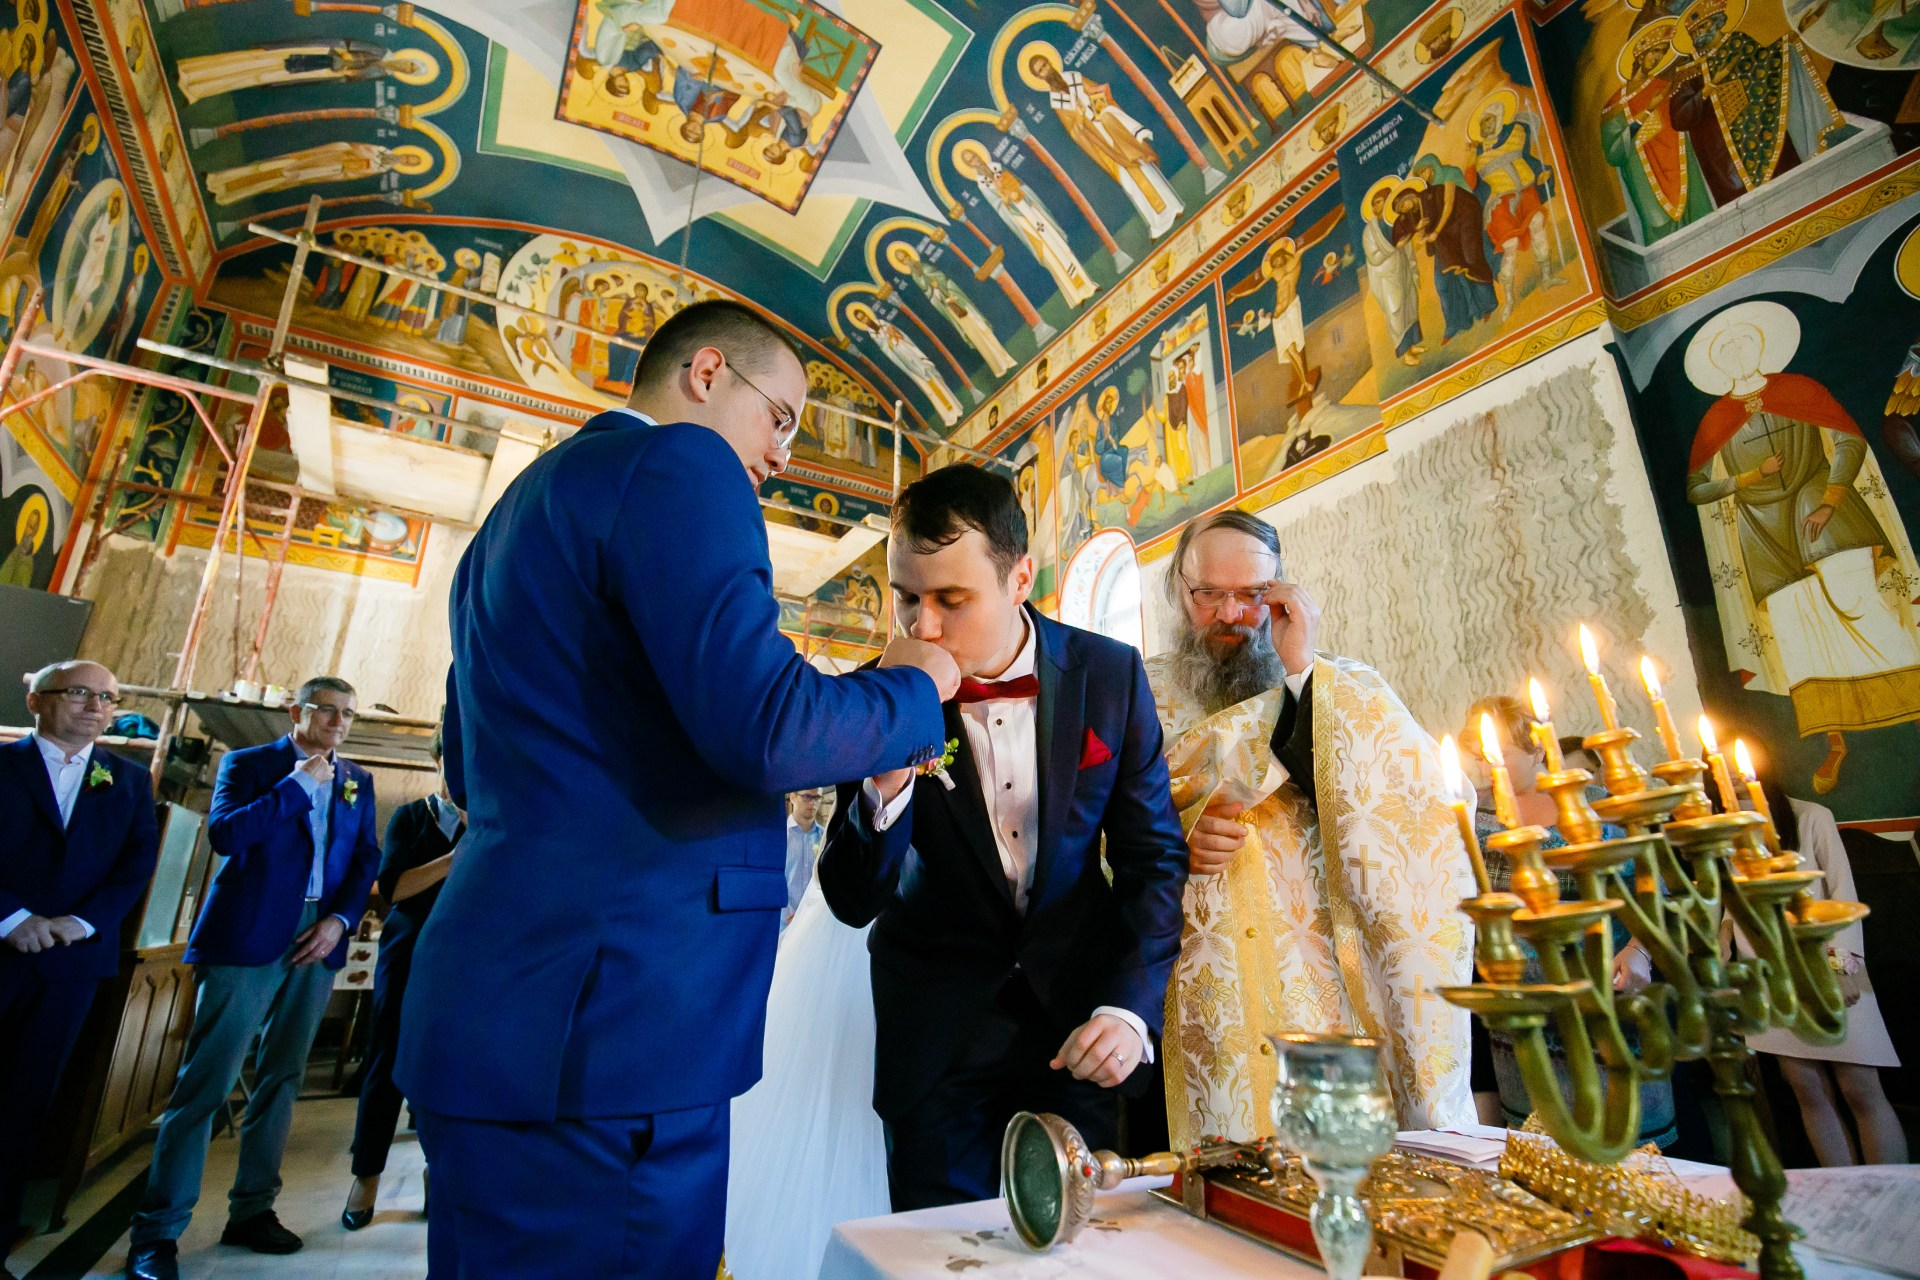 Alexandra si Vlad nunta iasi cununia religiosa mirele saruta mana nasului - fotograf profesionist nunta www.paulpadurariu.ro © 2017 Paul Padurariu